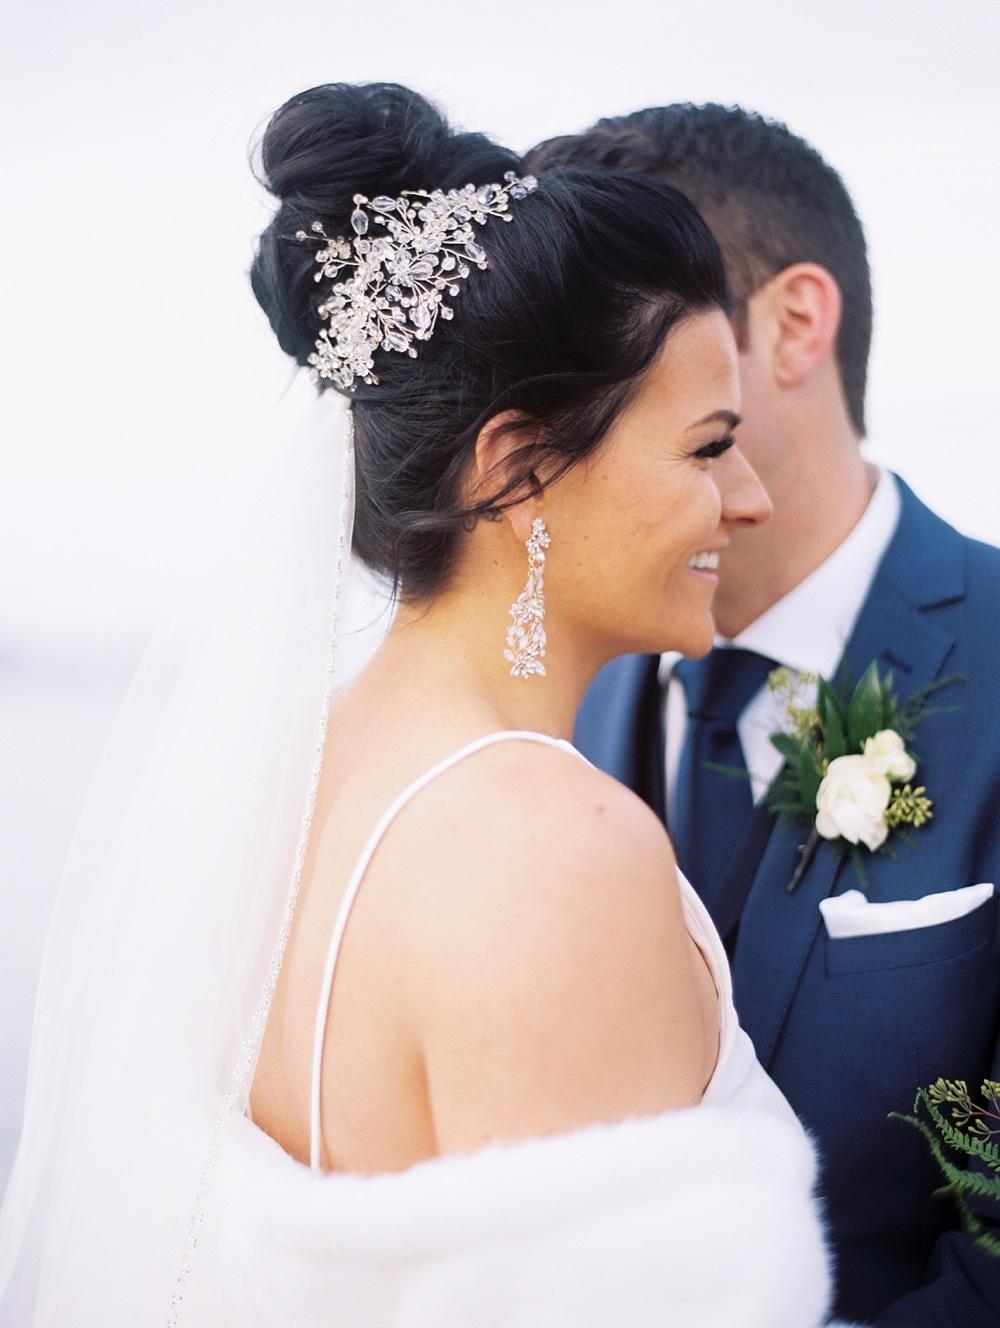 Kristin-La-Voie-Photography-chicago-wedding-photographer-125